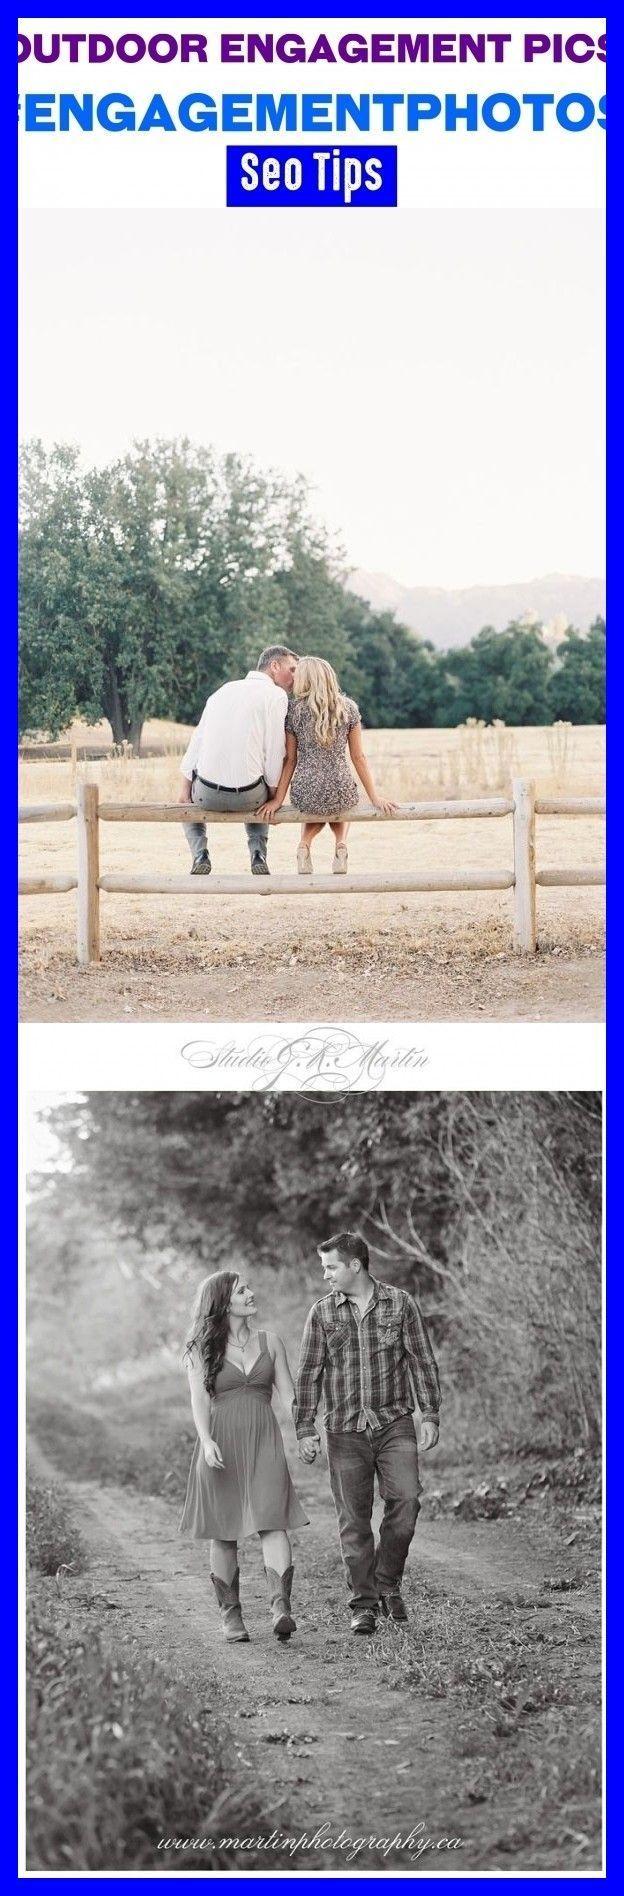 Outdoor engagement pics #engagementphotos #pinterestkeywords #weddings. engageme... -  Outdoor engagement pics #engagementphotos #pinterestkeywords #weddings. engagement pics indian, eng - #engageme #Engagement #EngagementPhotosclassy #EngagementPhotosindian #EngagementPhotoswoods #engagementphotos #formalEngagementPhotos #naturalEngagementPhotos #outdoor #pics #pinterestkeywords #plussizeEngagementPhotos #rusticEngagementPhotos #weddings #whattowearforEngagementPhotos